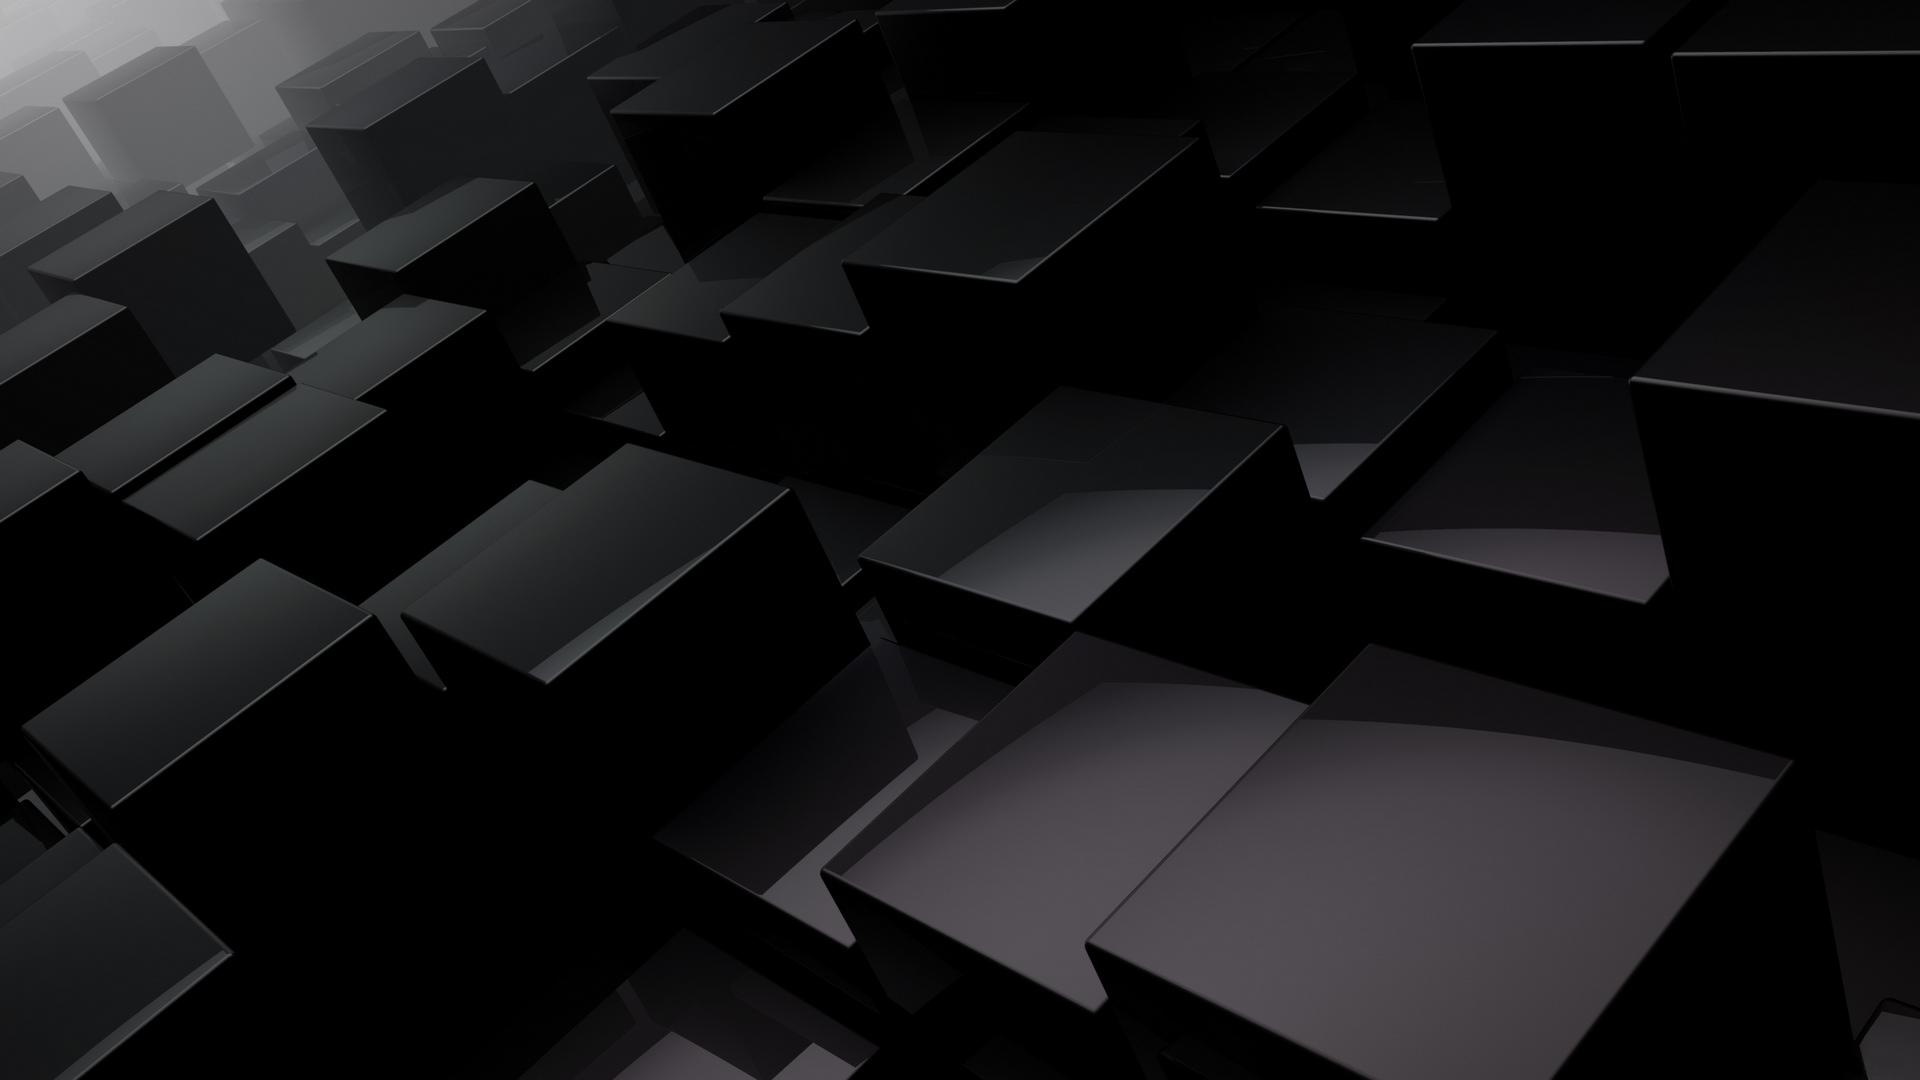 Color Black Wallpaper 21 Widescreen Wallpaper Background Images Dark Color 1920x1080 Download Hd Wallpaper Wallpapertip